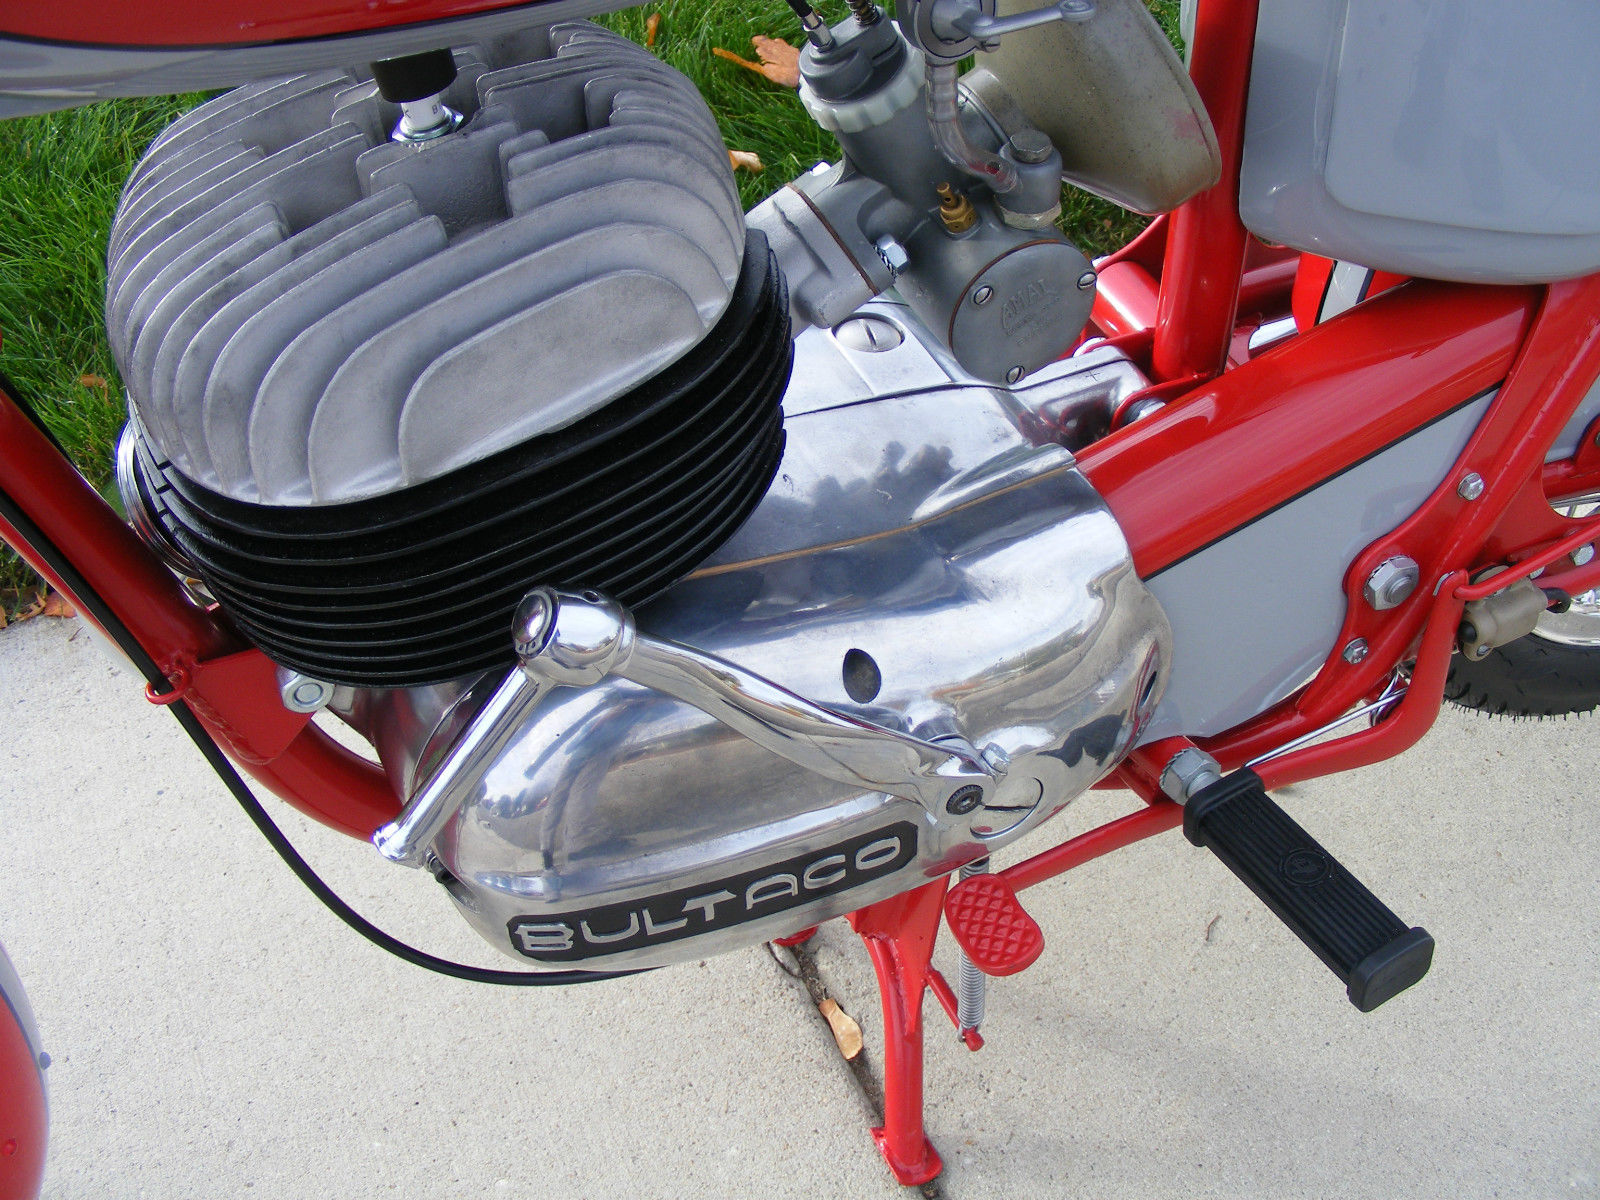 Bultaco Mercurio - 1966 - Engine and Gearbox.